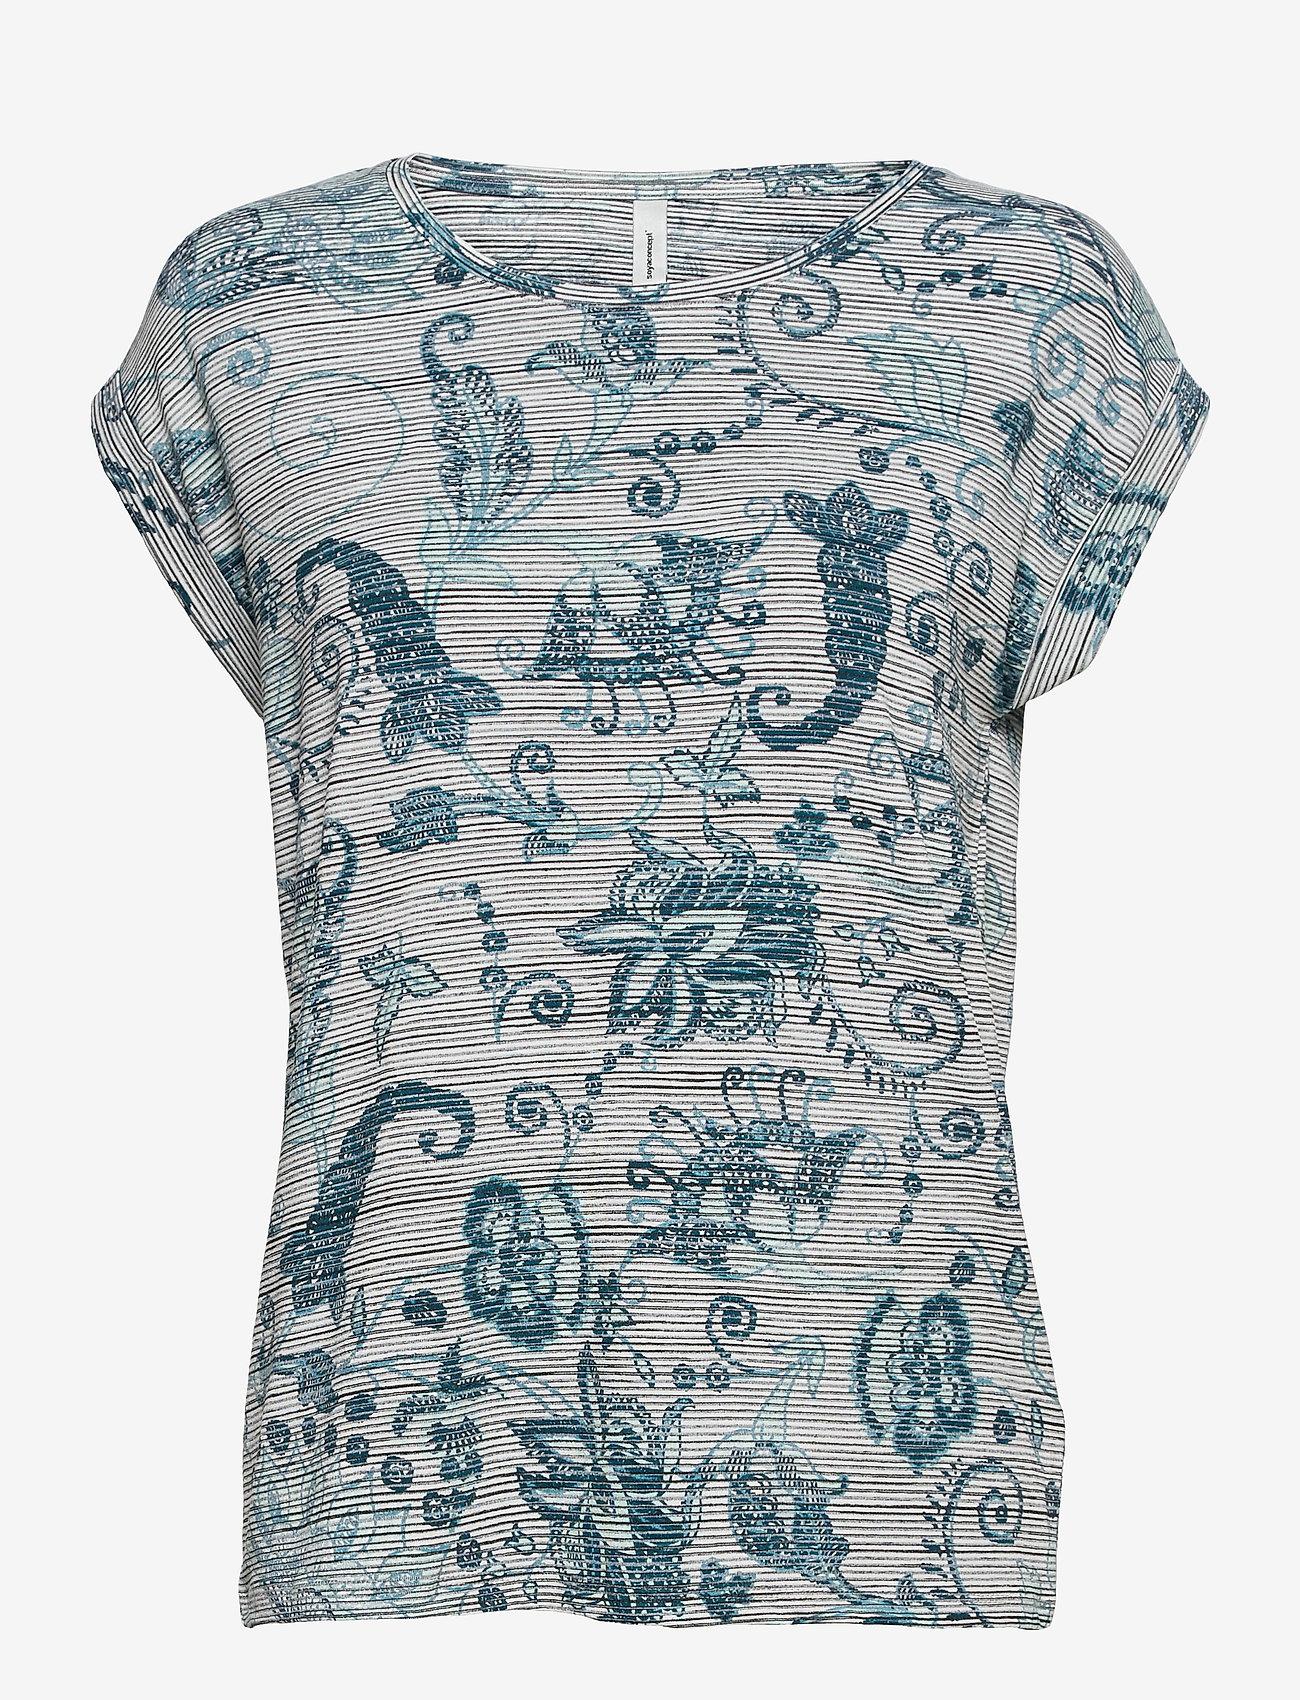 Soyaconcept - SC-GALINA - t-shirts - turquoise combi - 0